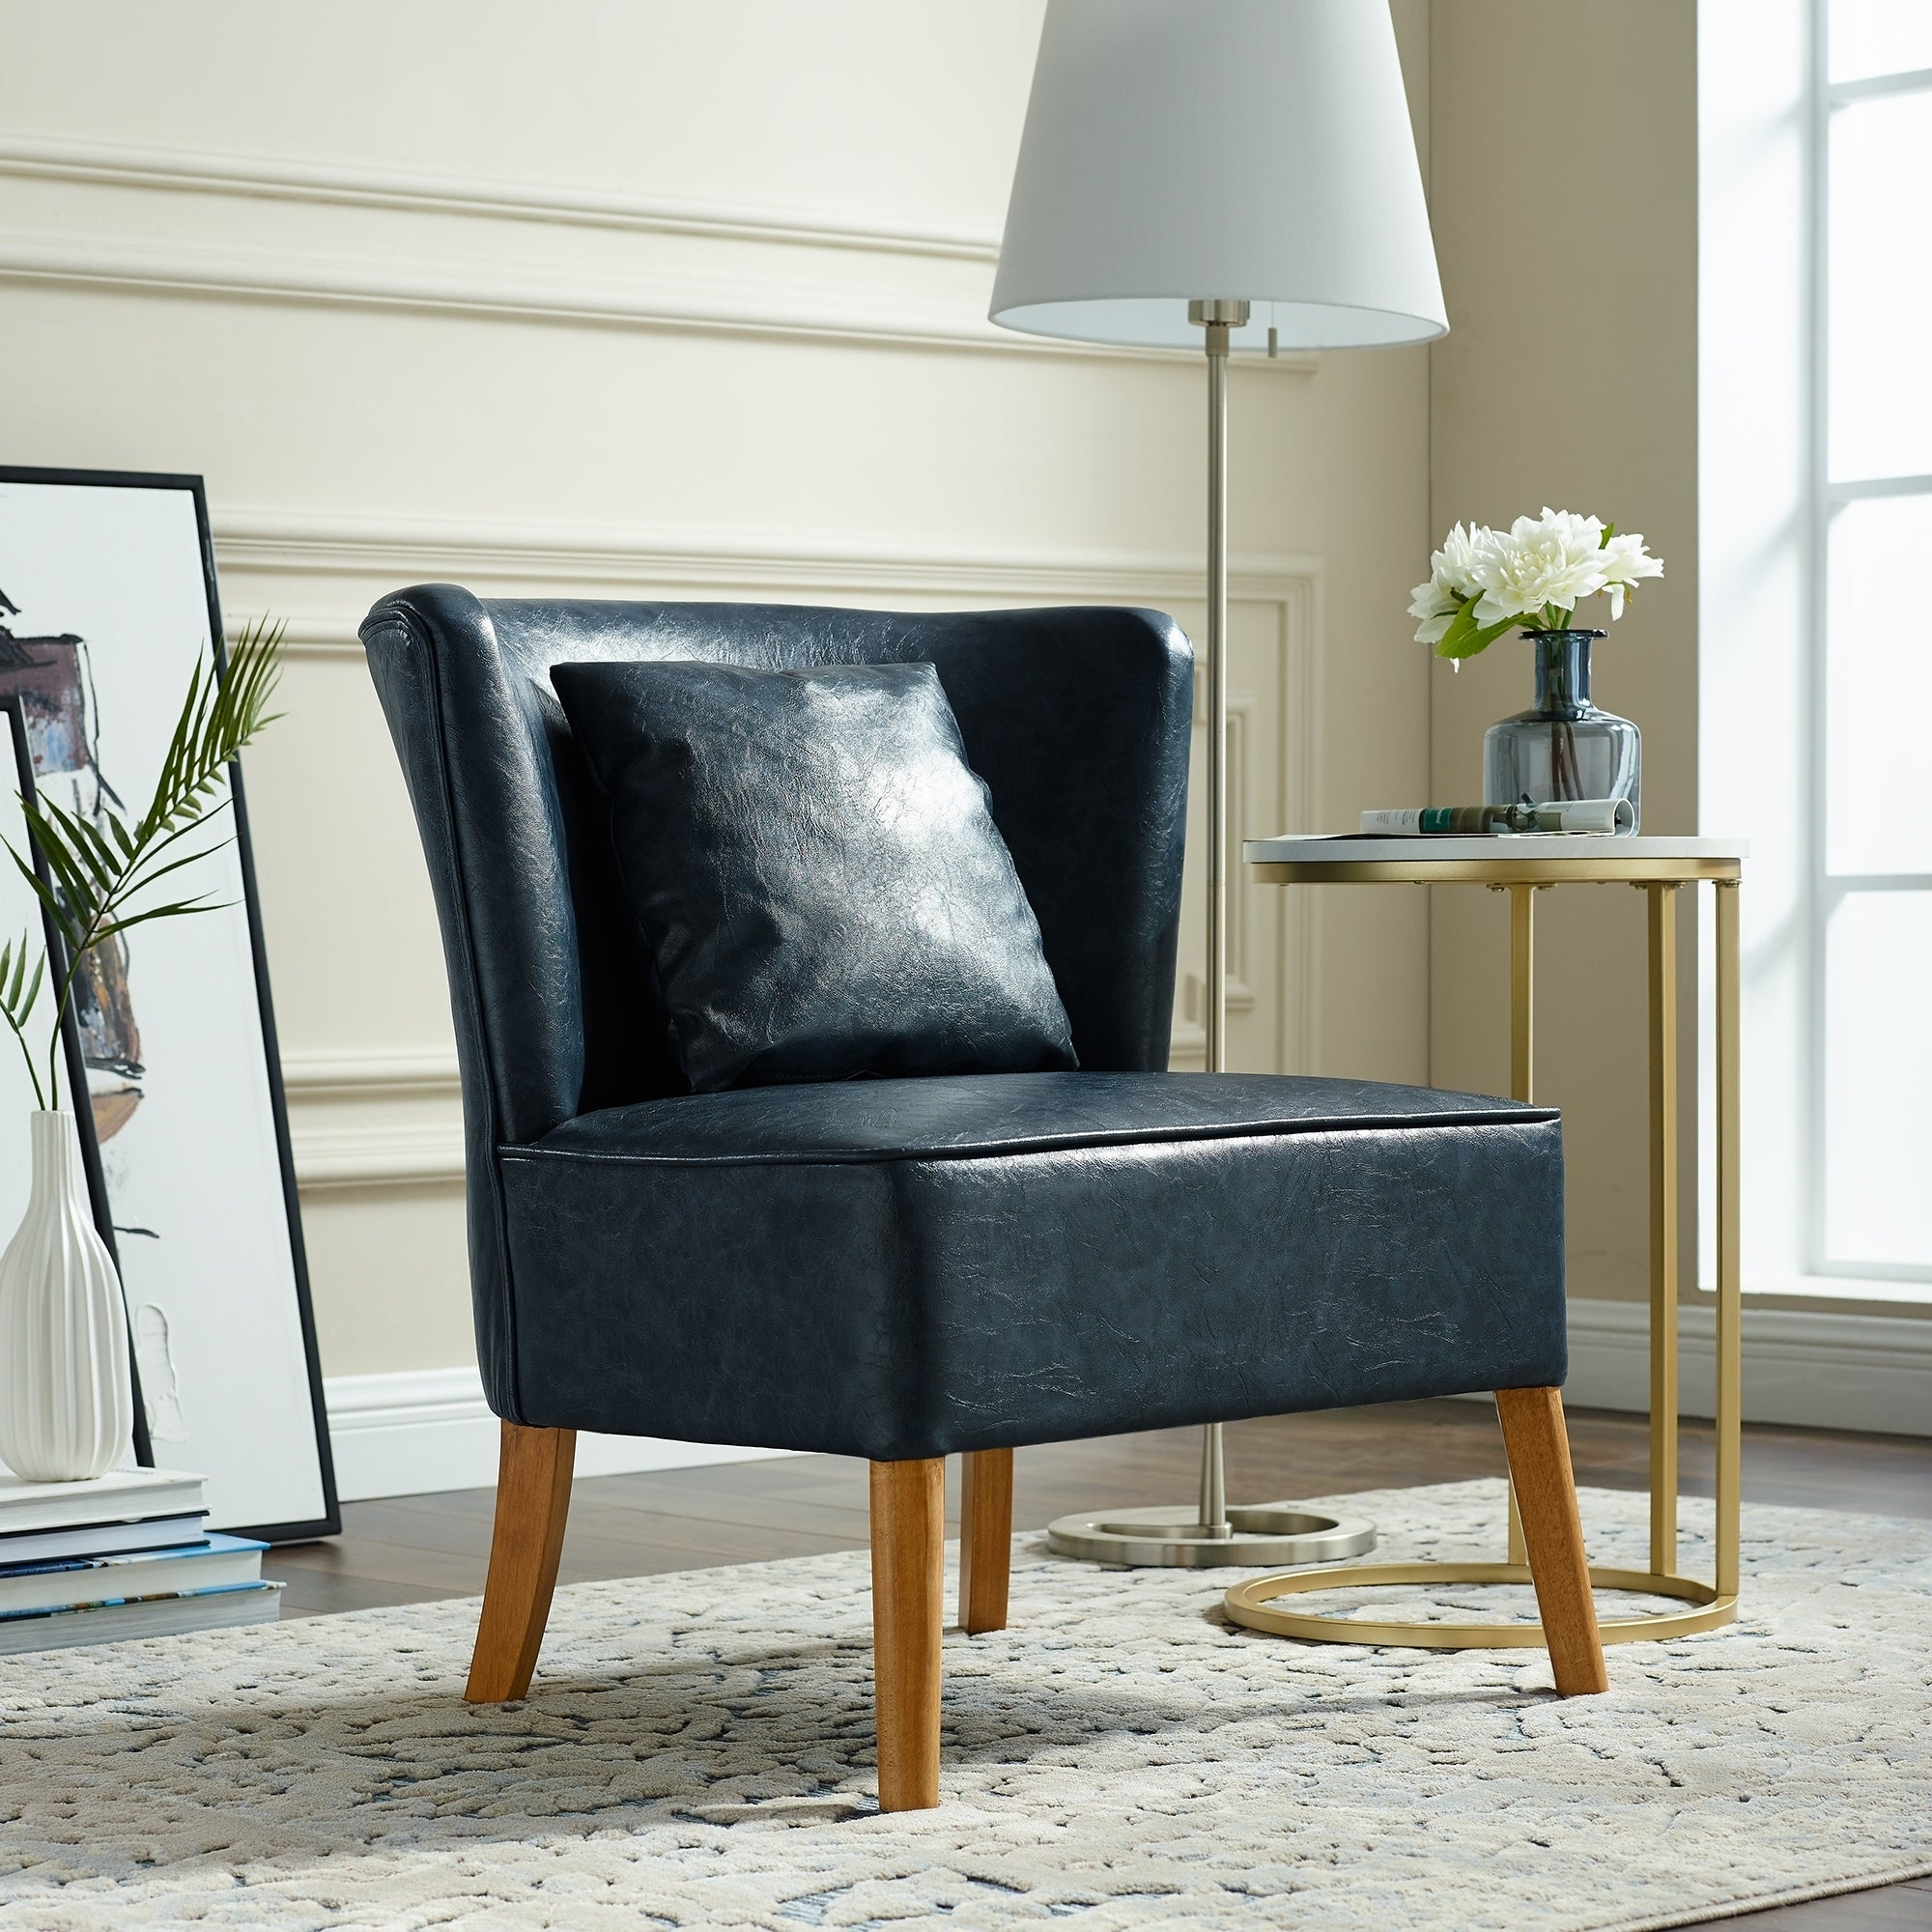 Brilliant Curved Back Upholstered Accent Chair 26 X 25 X 31H Inzonedesignstudio Interior Chair Design Inzonedesignstudiocom